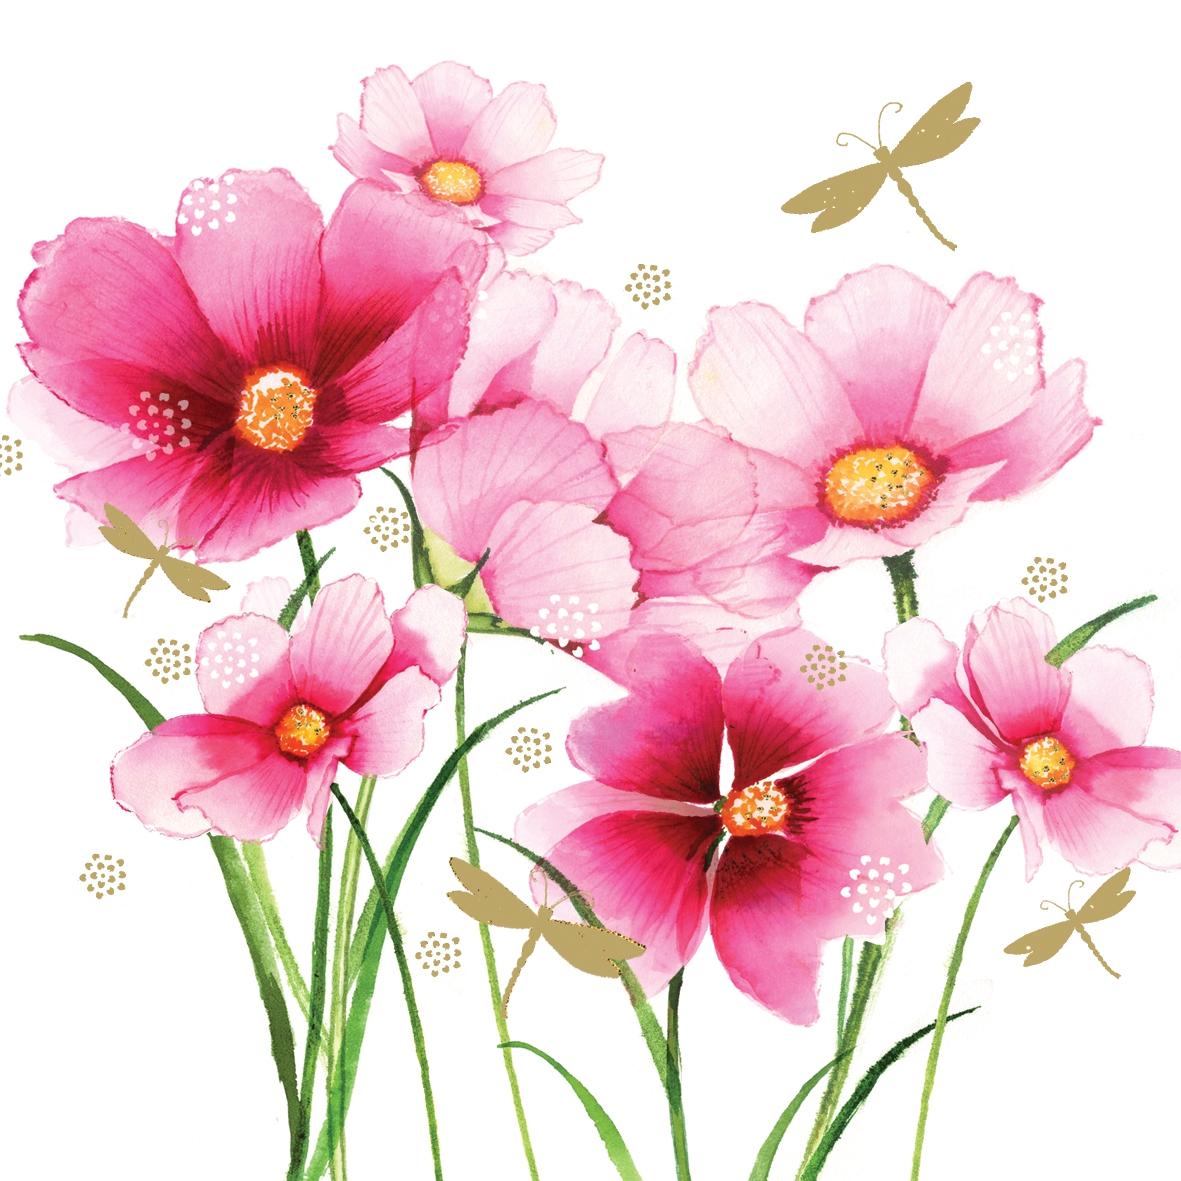 Lunch Servietten Flowers & Dragonfly